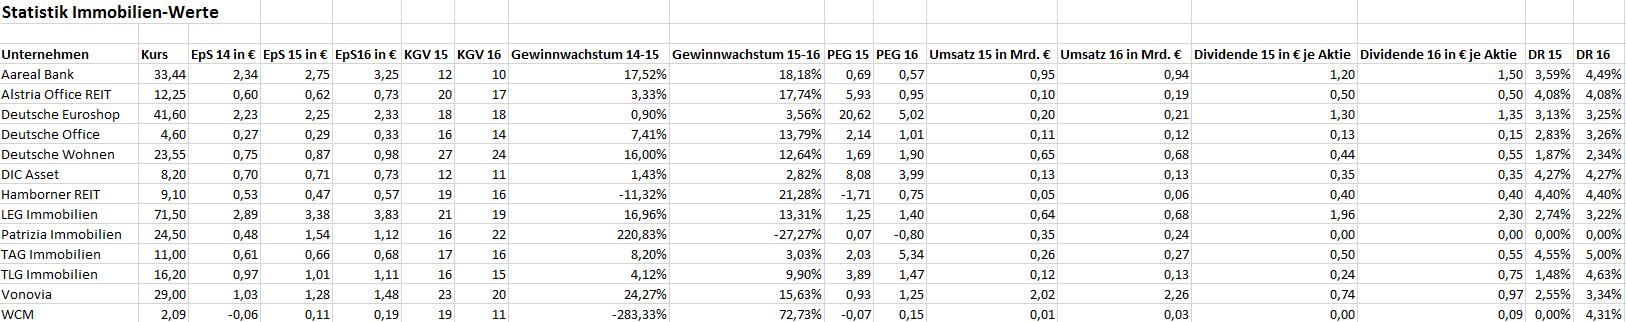 IMMOBILIENWERTE-Die-Ruhe-vor-dem-Sturm-Chartanalyse-Bastian-Galuschka-GodmodeTrader.de-1